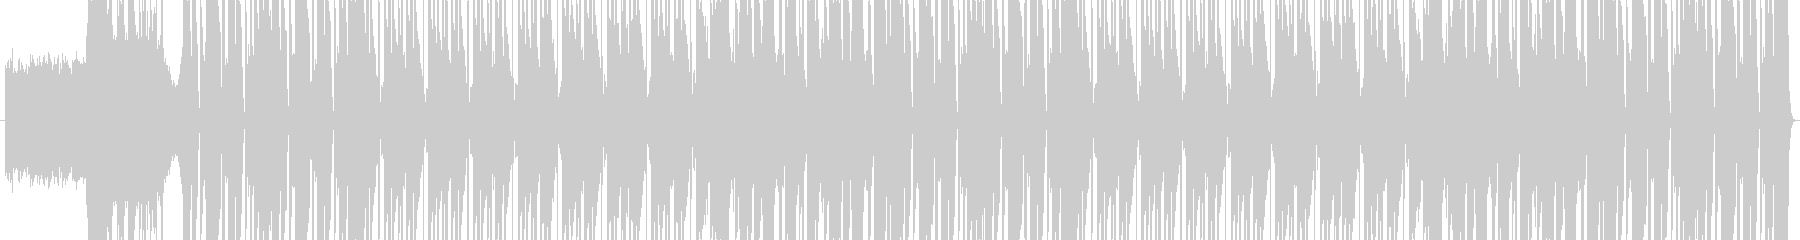 HIP HOP BEAT 04の未再生の波形